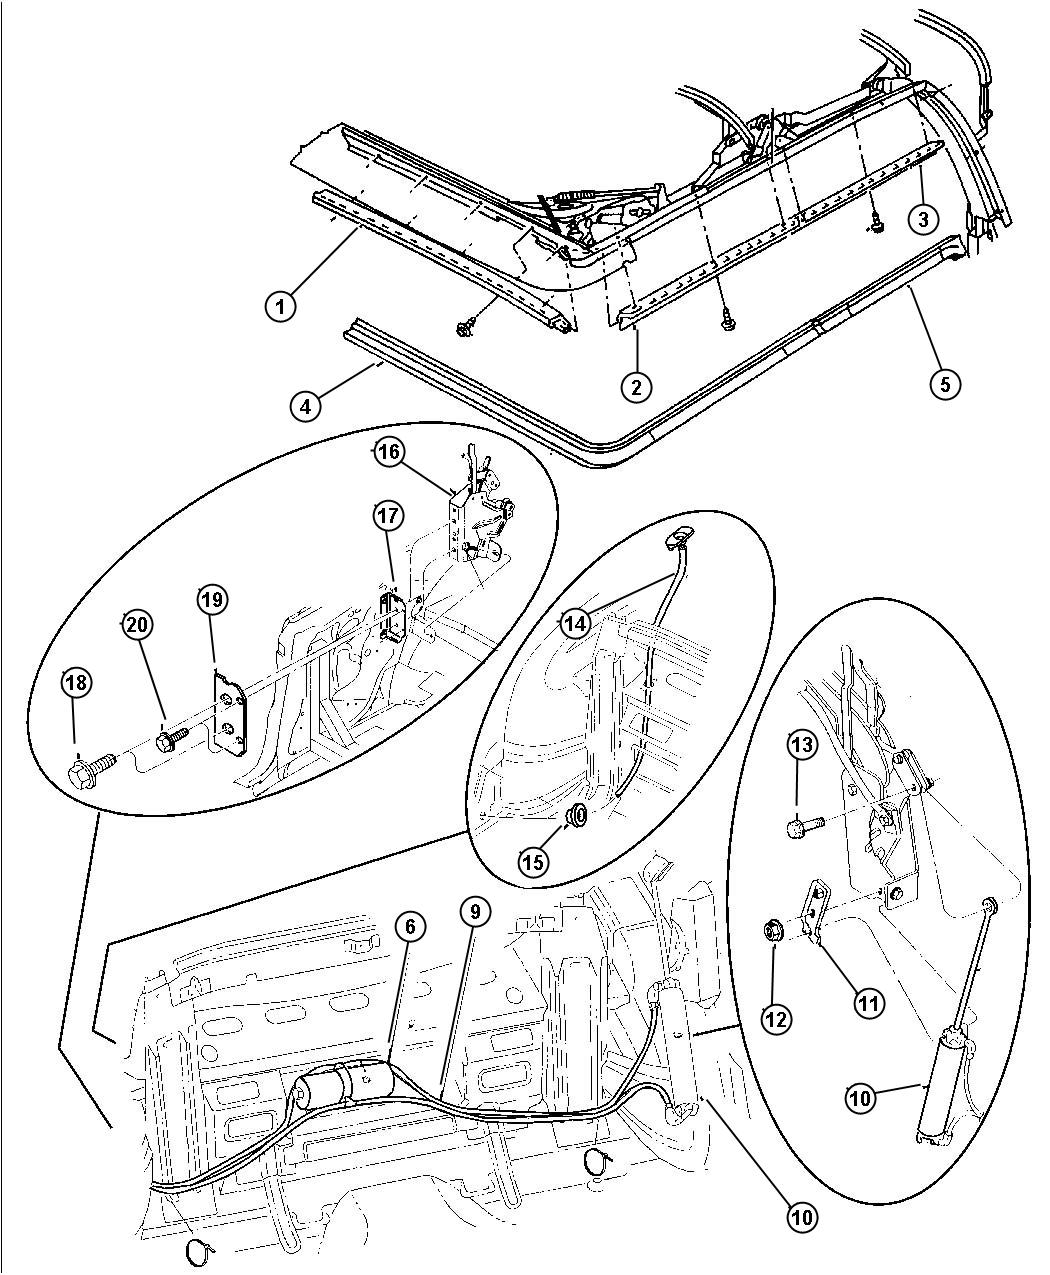 1999 Chrysler Sebring Convertible Motor And Weatherstrip